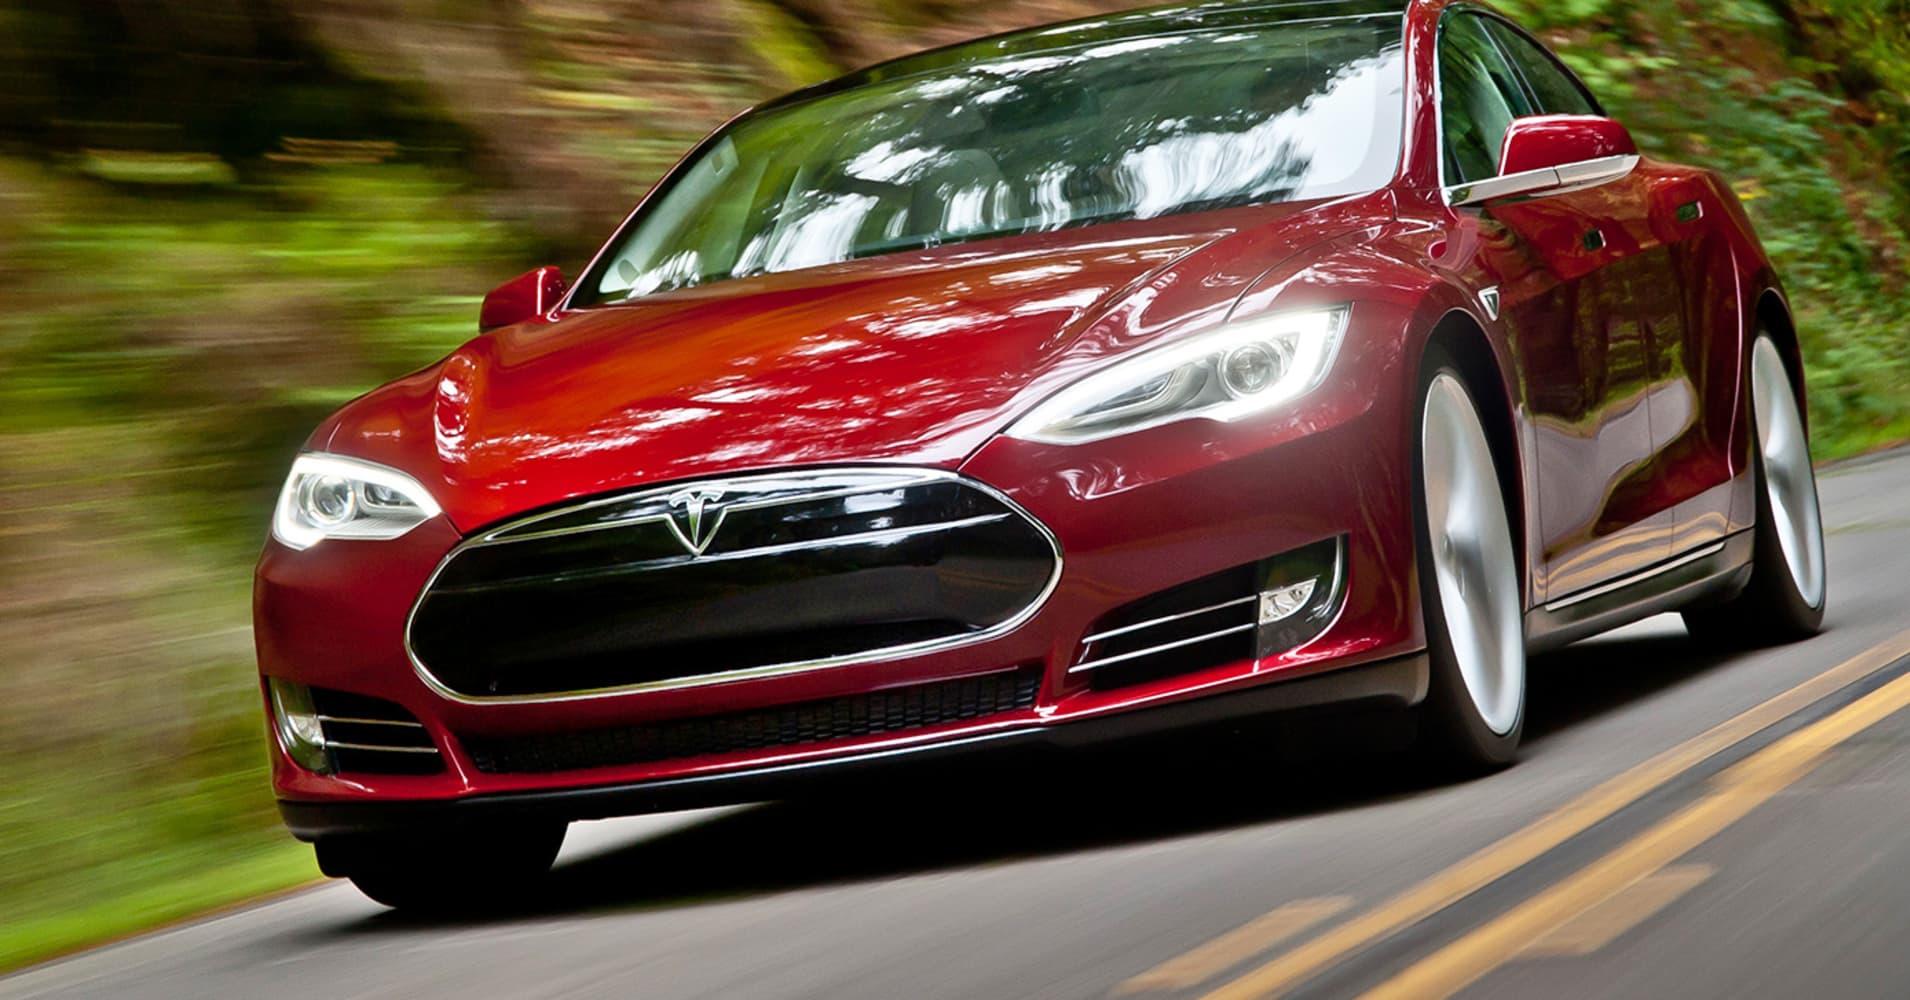 Tesla Model X beats Lamborghini and sets new record in drag race